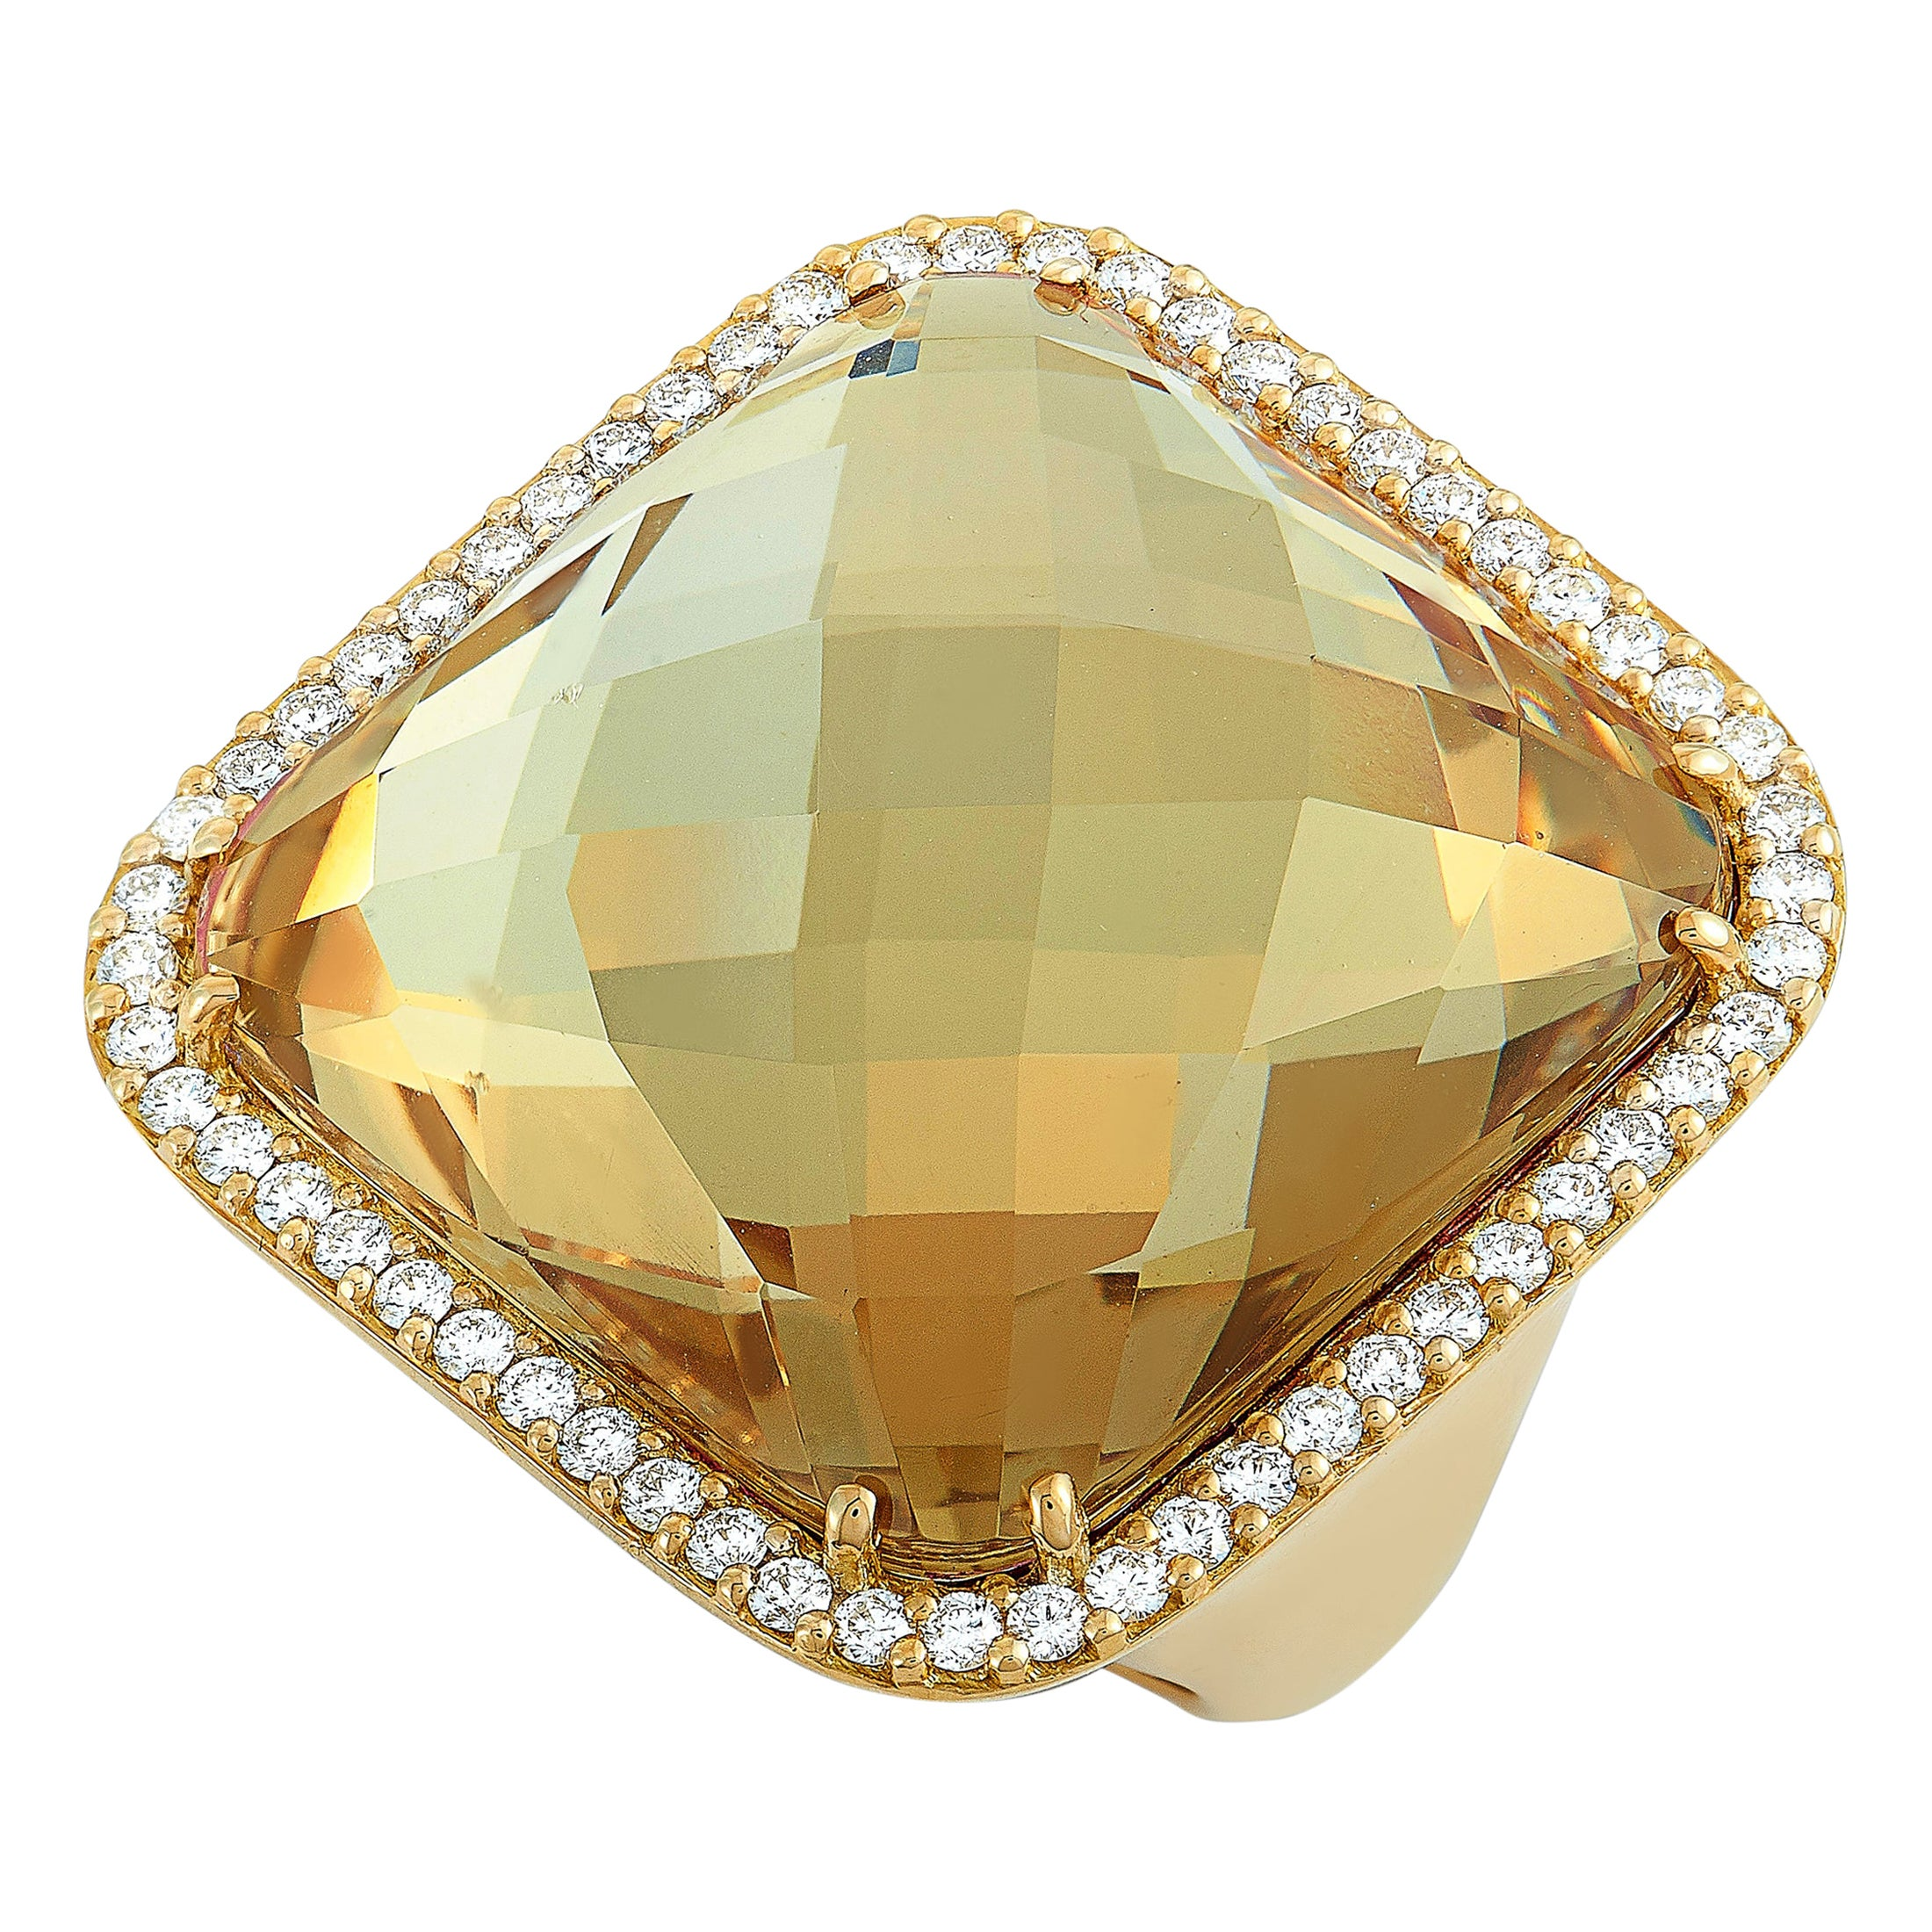 Roberto Coin 18 Karat Yellow Gold Diamond and Smoky Quartz Ring